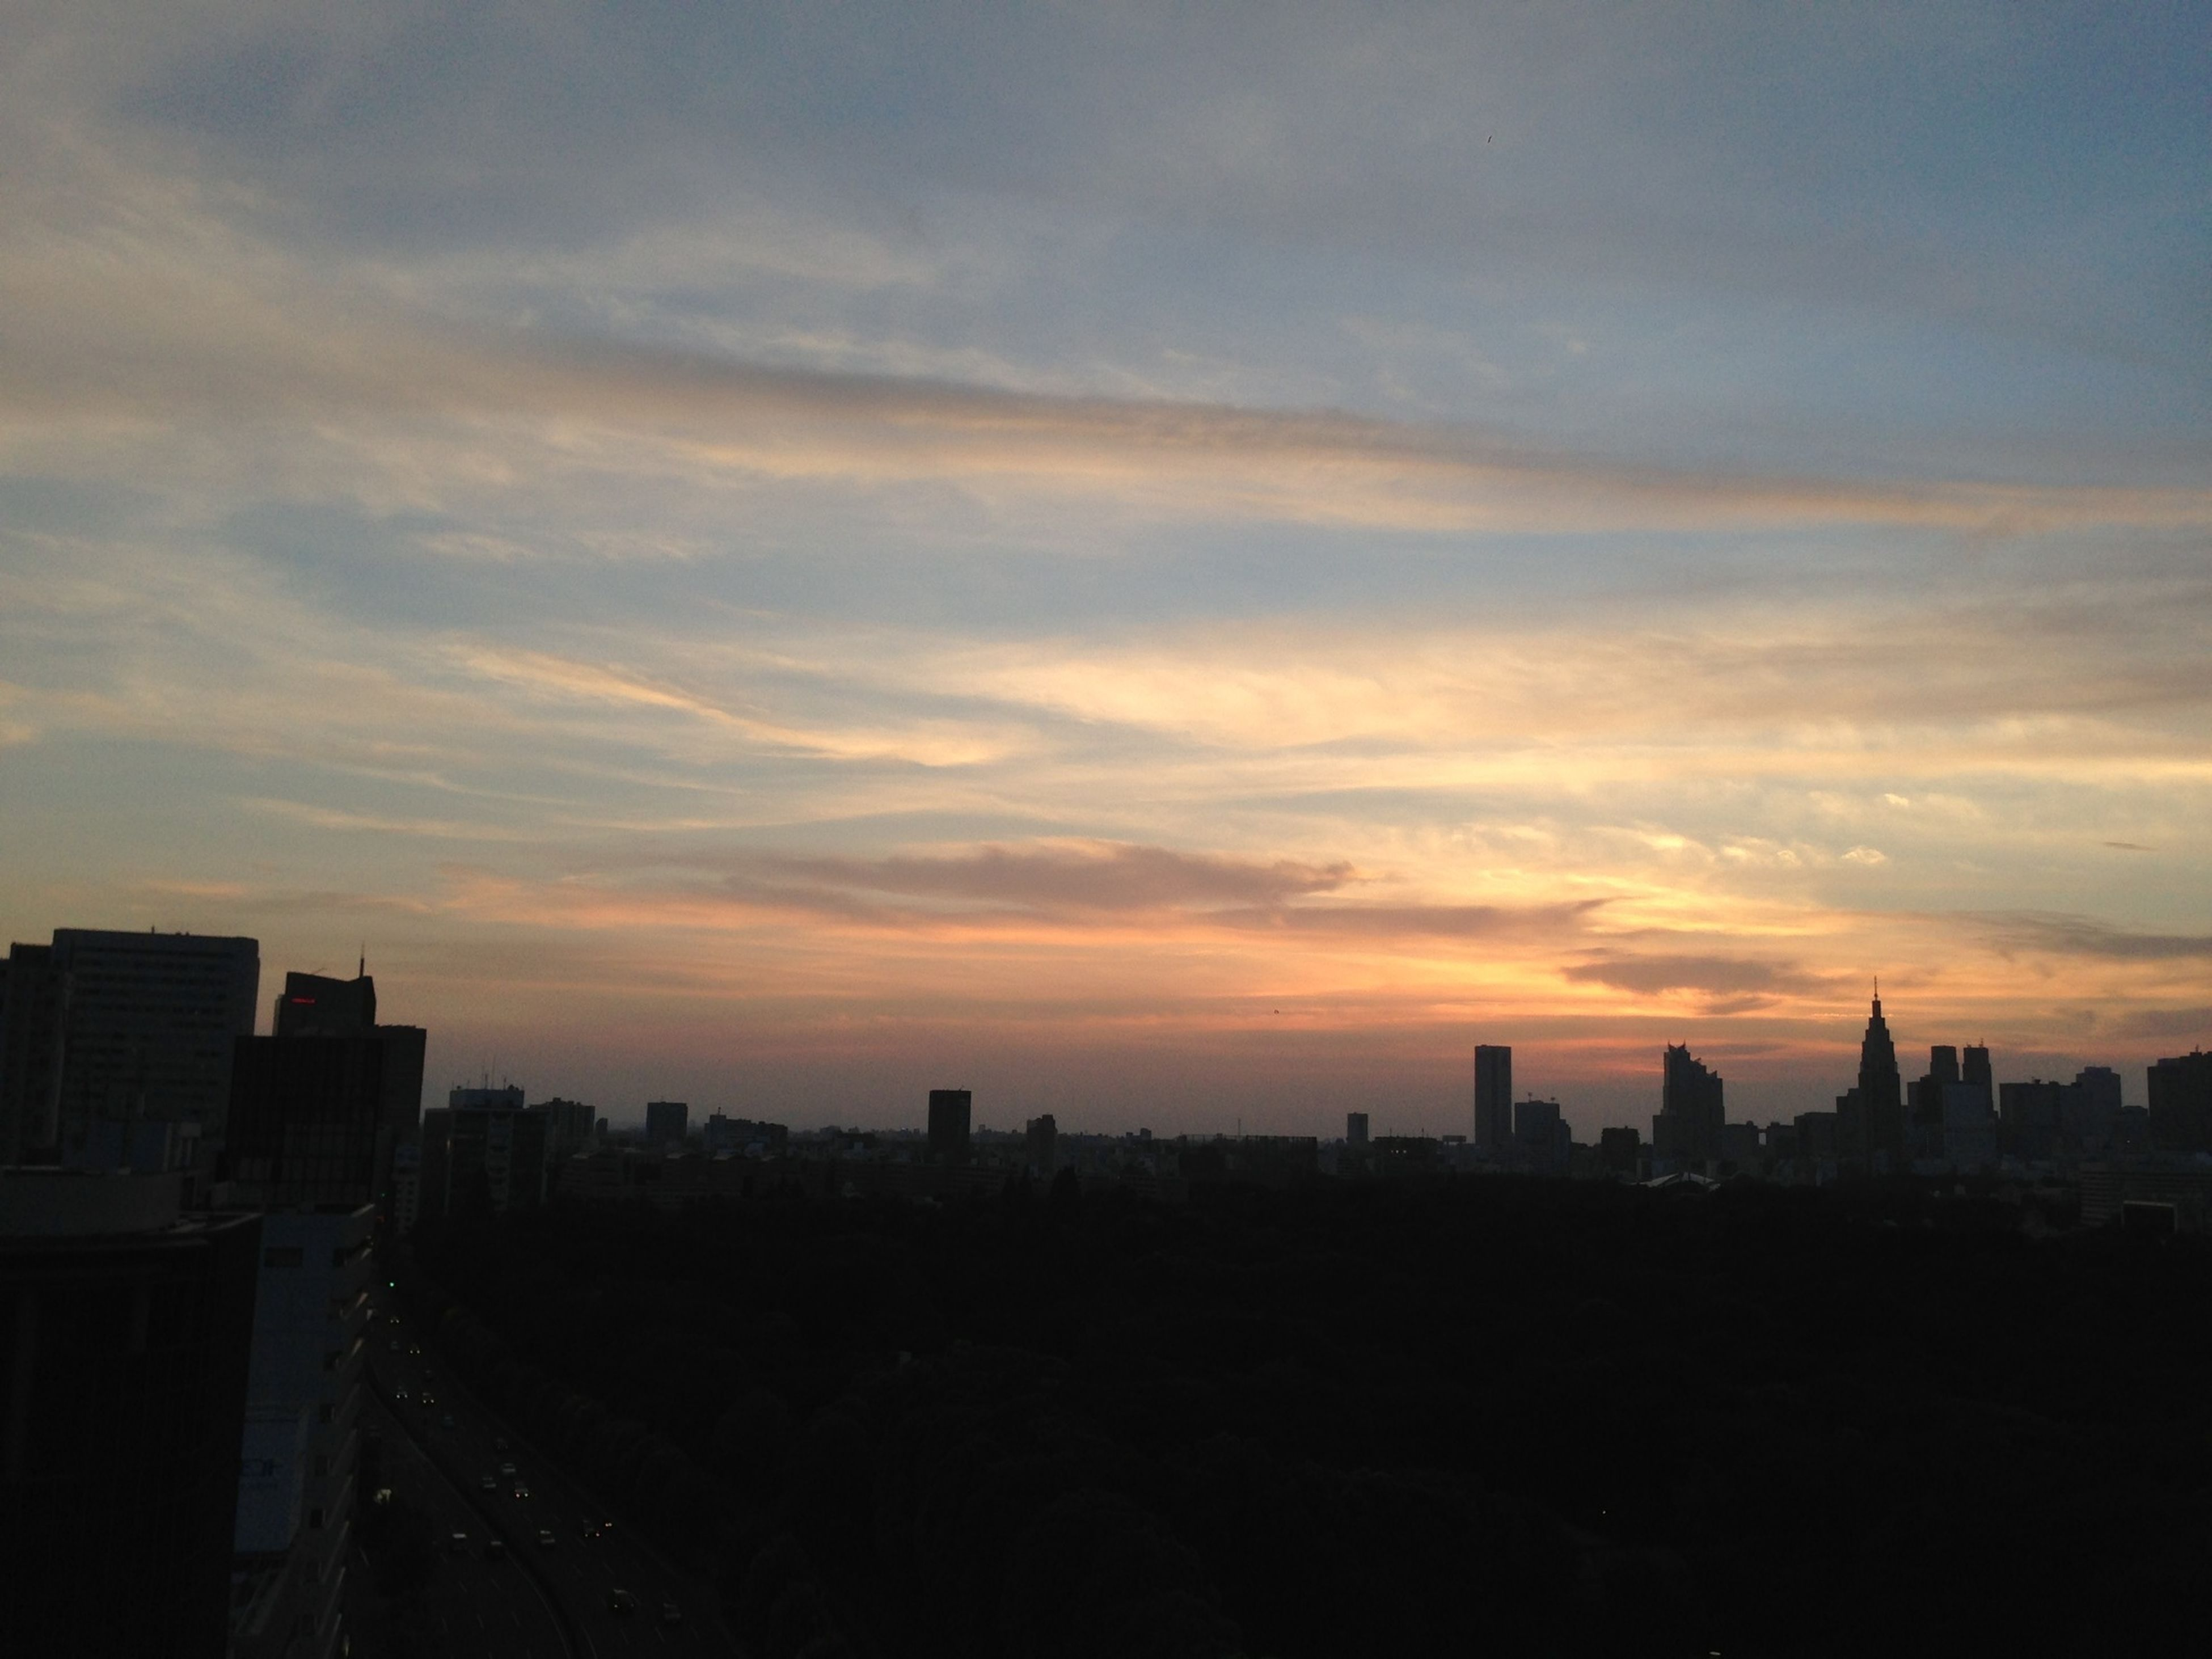 sunset, silhouette, building exterior, architecture, built structure, sky, orange color, city, cloud - sky, cityscape, scenics, beauty in nature, nature, outdoors, cloud, dramatic sky, dusk, dark, no people, building